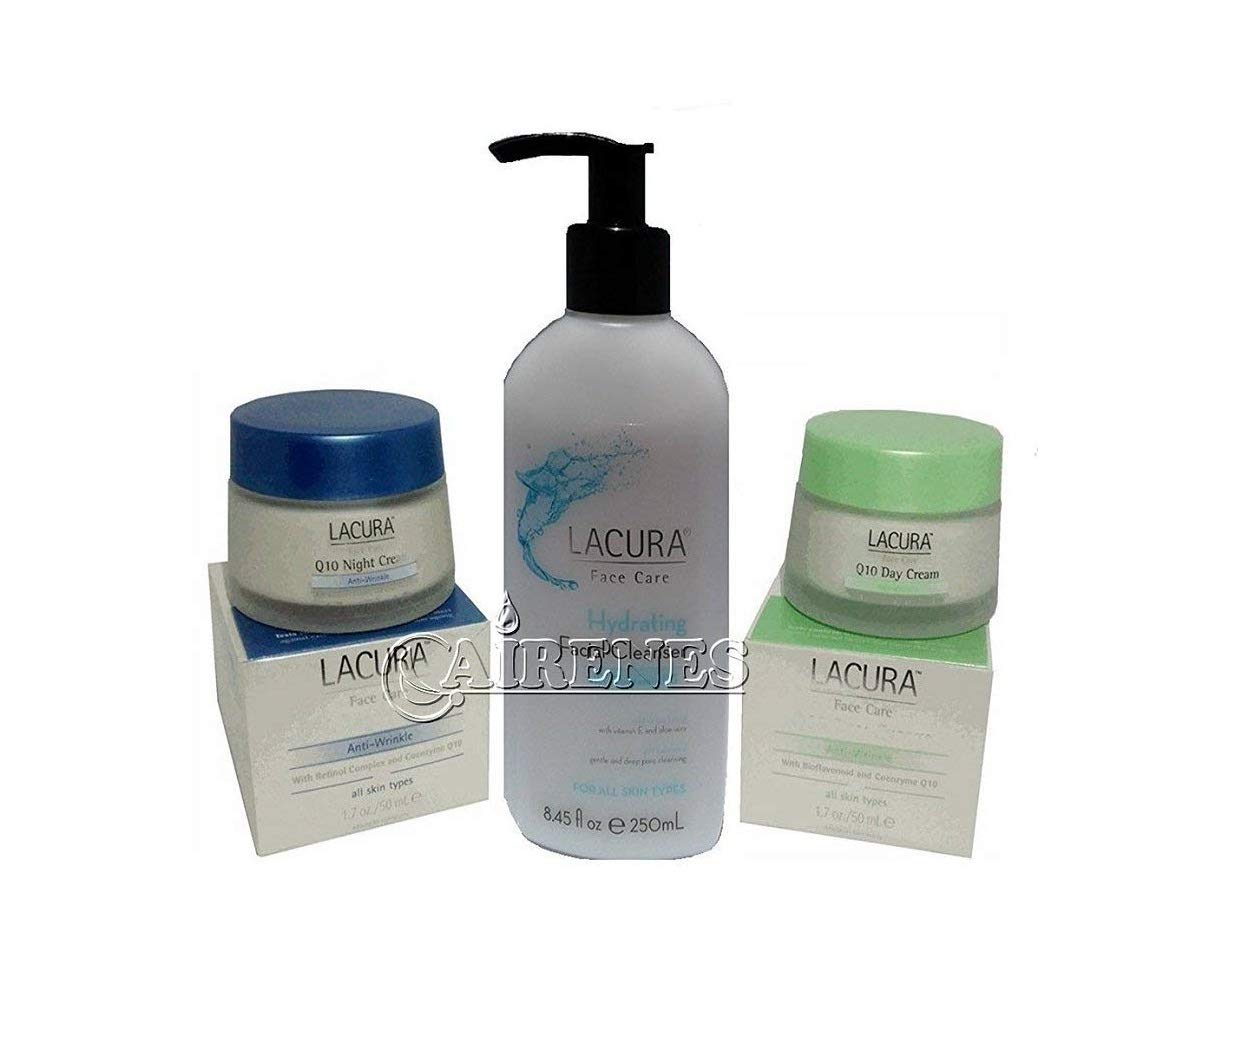 Lacura Face Care Q10 Renew Anti-Wrinkle Day Cream + Lacura Q10 Anti-Aging Night Cream + Lacura Hydrating Facial Cleanser. (3 Pack)